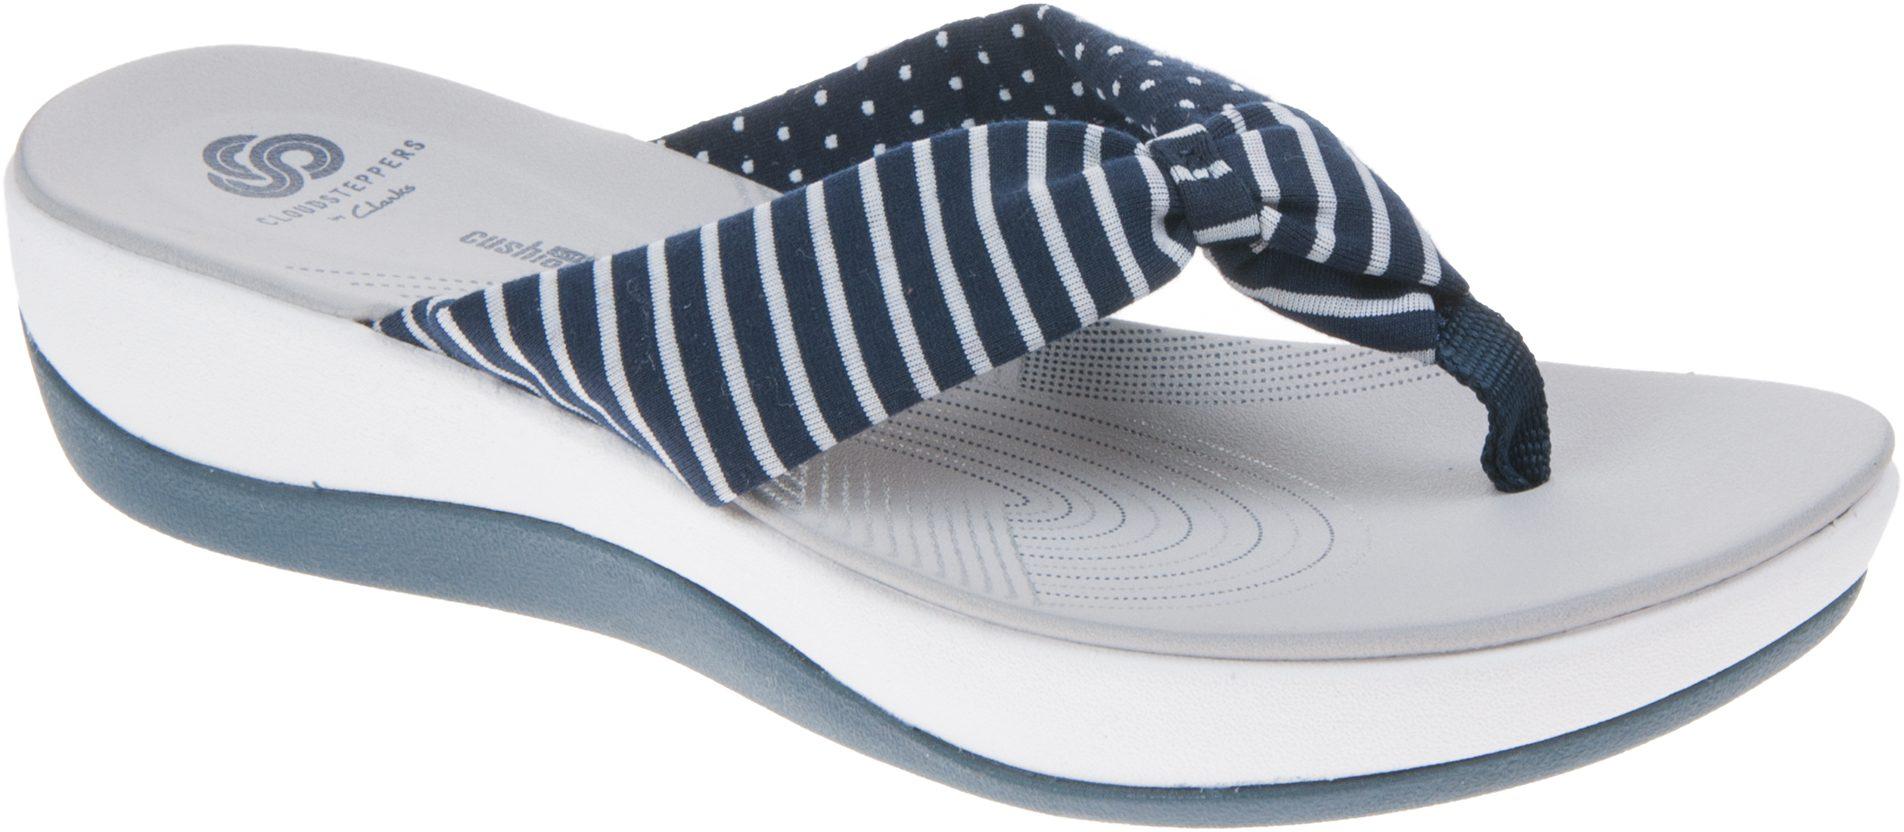 96cd6c131bc2 Clarks Arla Glison Navy Comb 26134255 - Toe Post Sandals - Humphries Shoes